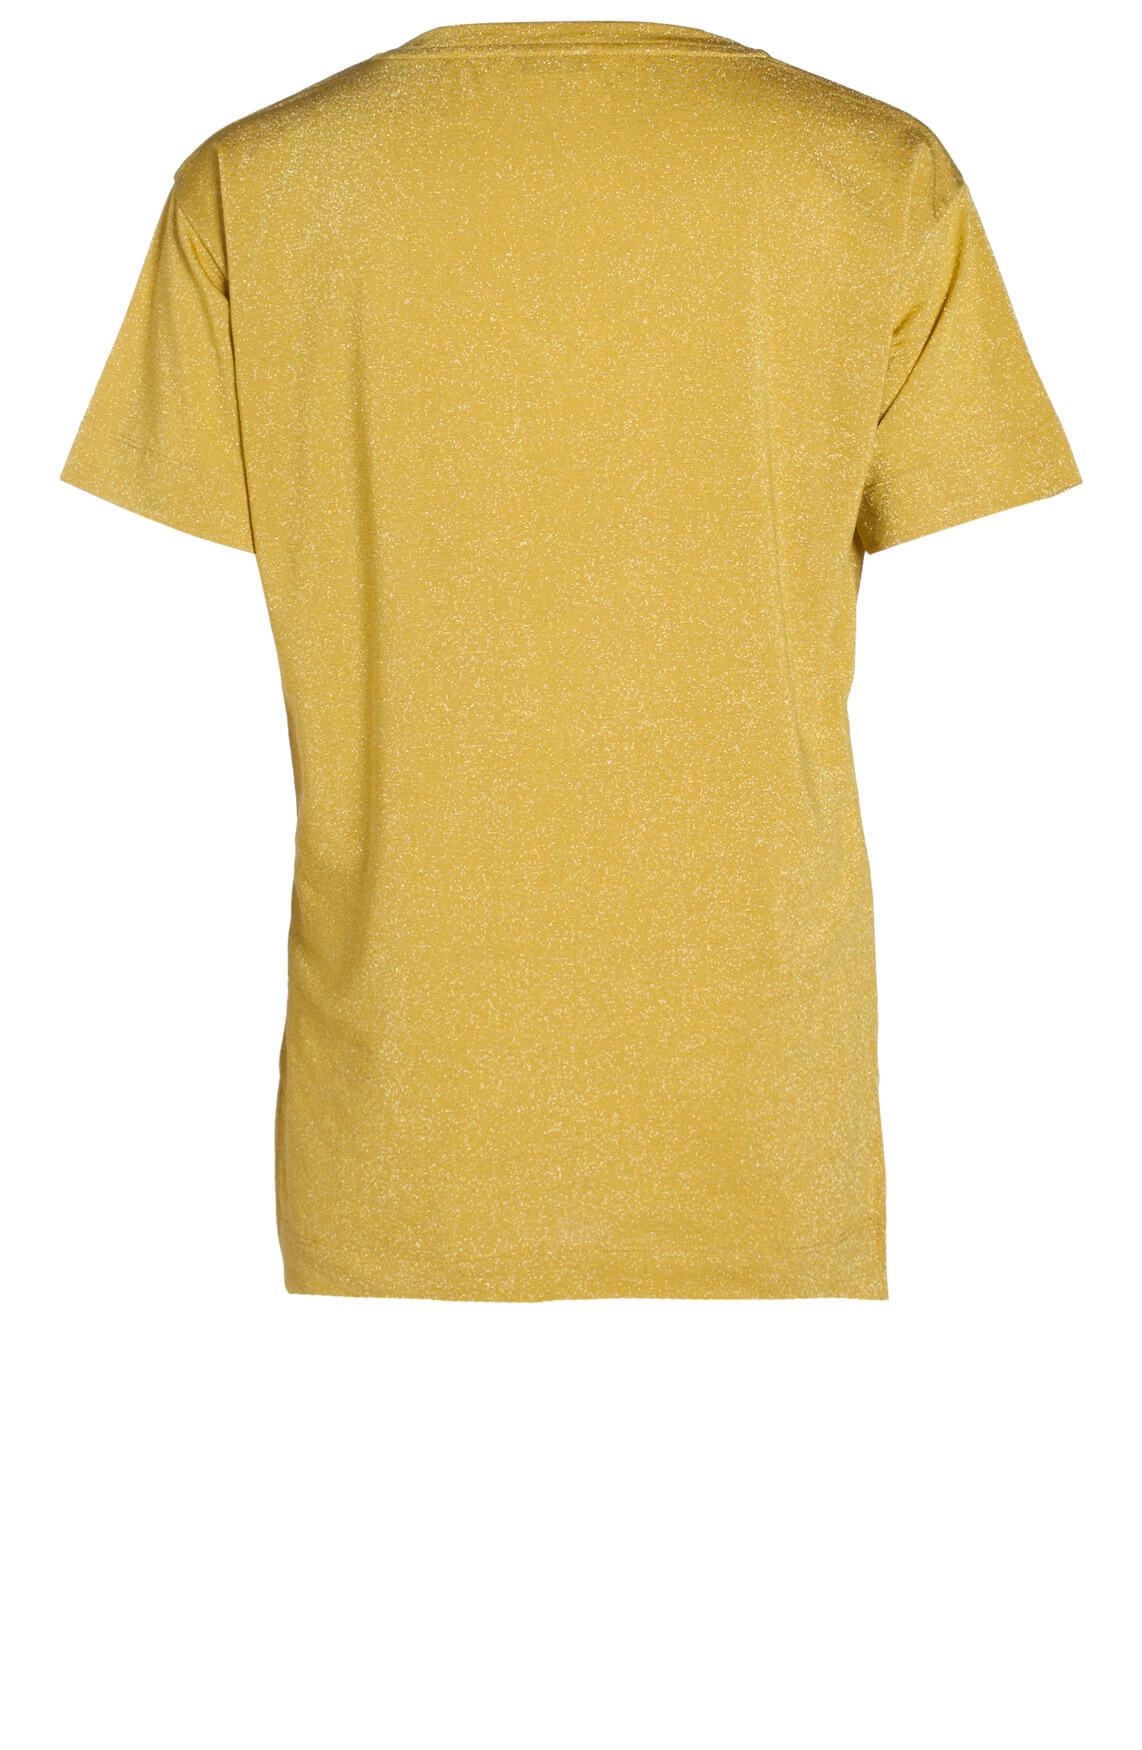 Anna Dames Glittershirt geel